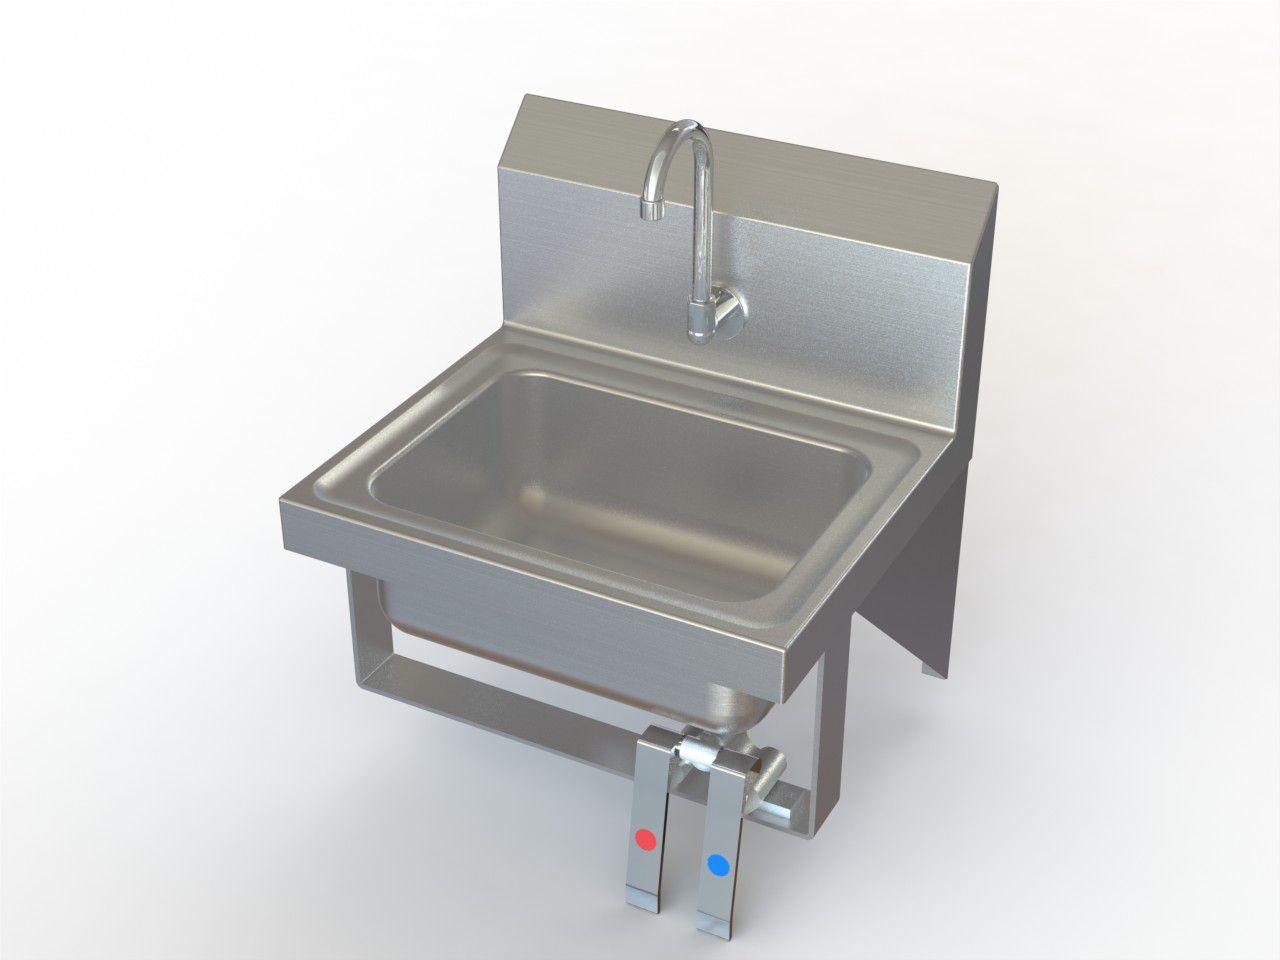 Aero Manufacturing Hand Sink - Faucet, Knee Valve, Ss, Each - Model HSK